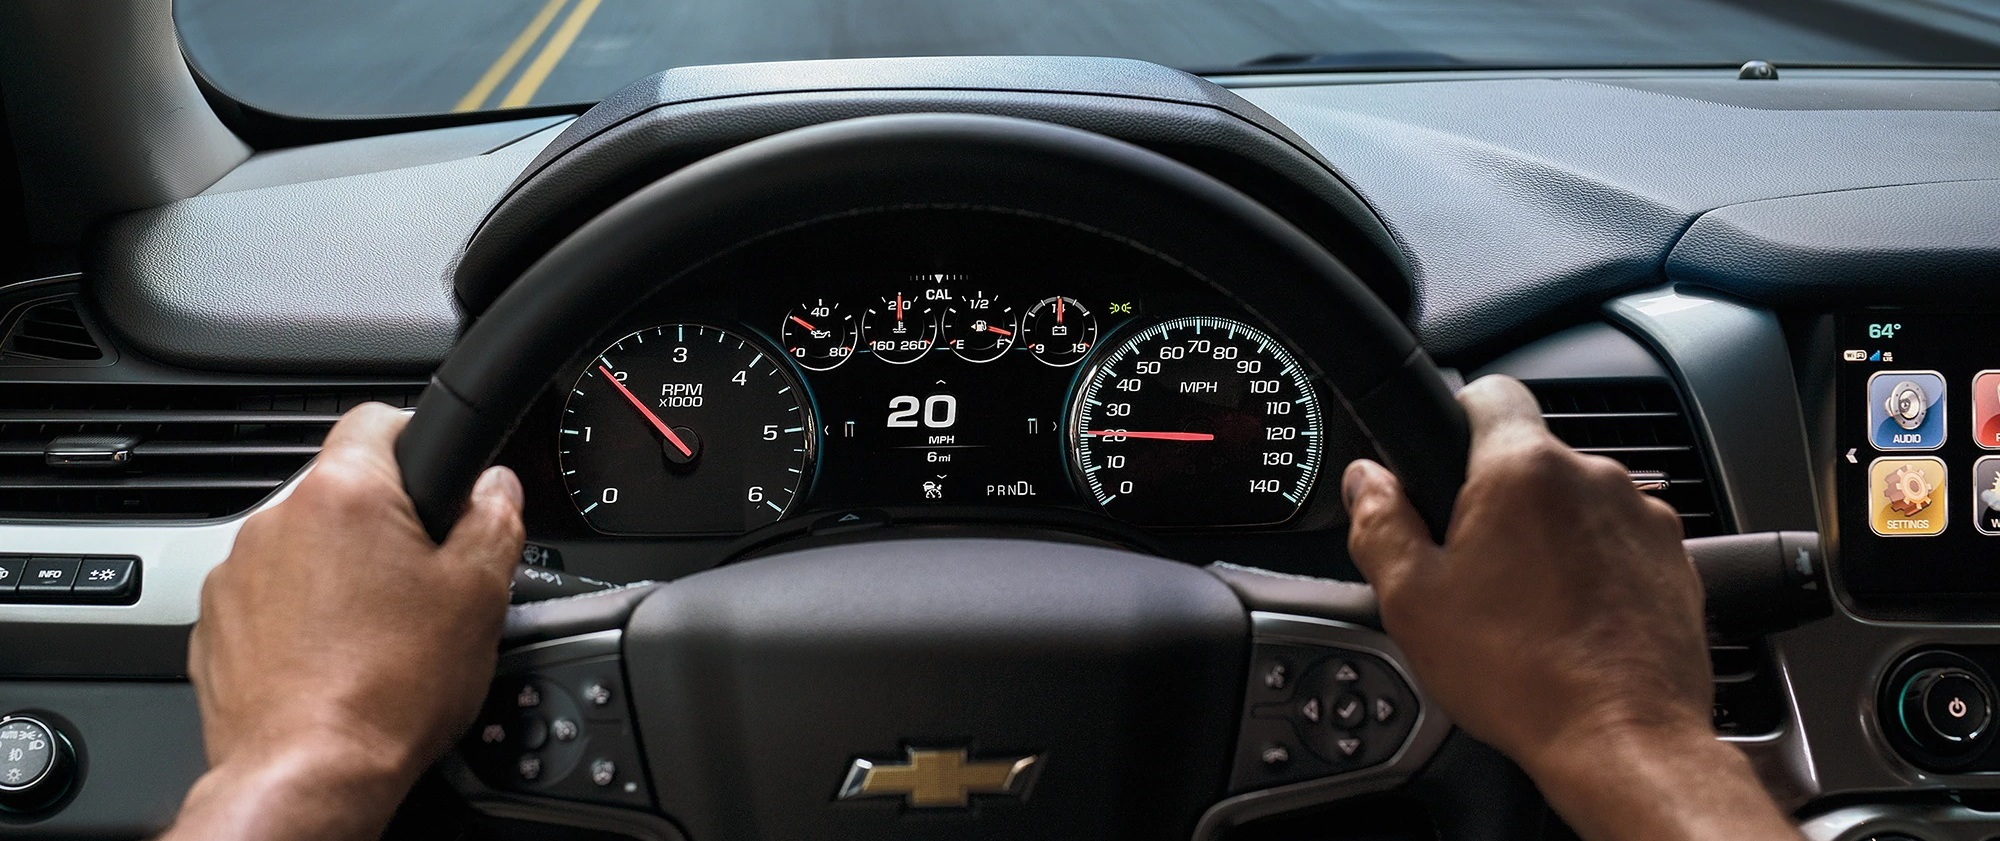 2020 Chevrolet Tahoe Dashboard